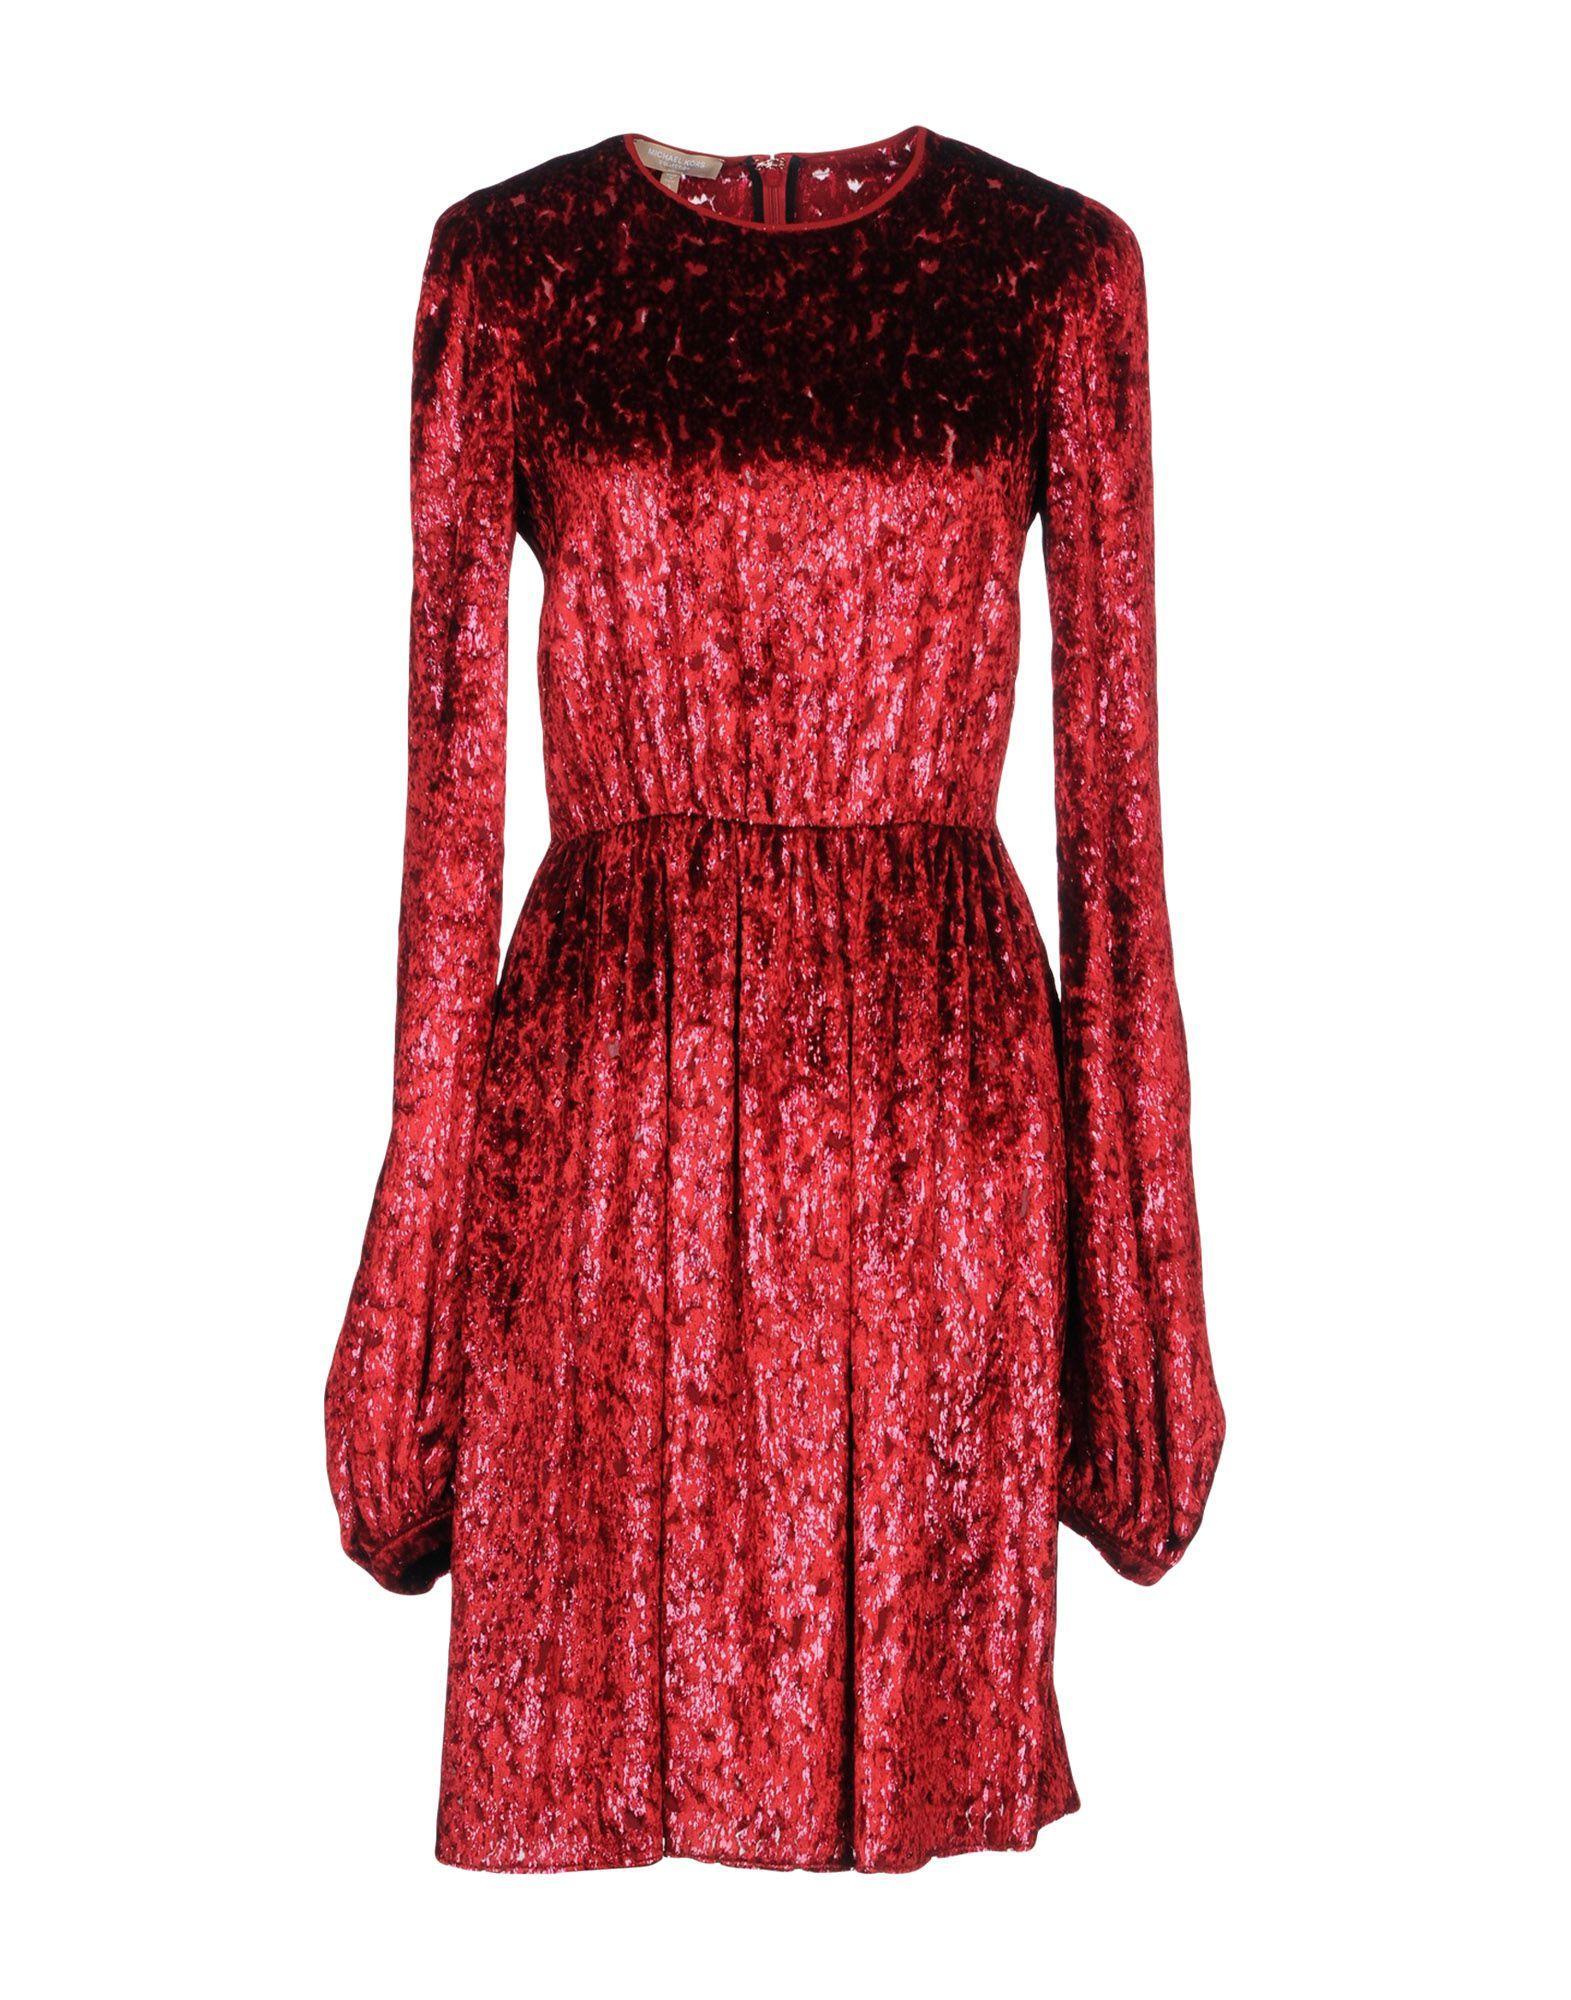 Michael Kors Knee-Length Dress In Red